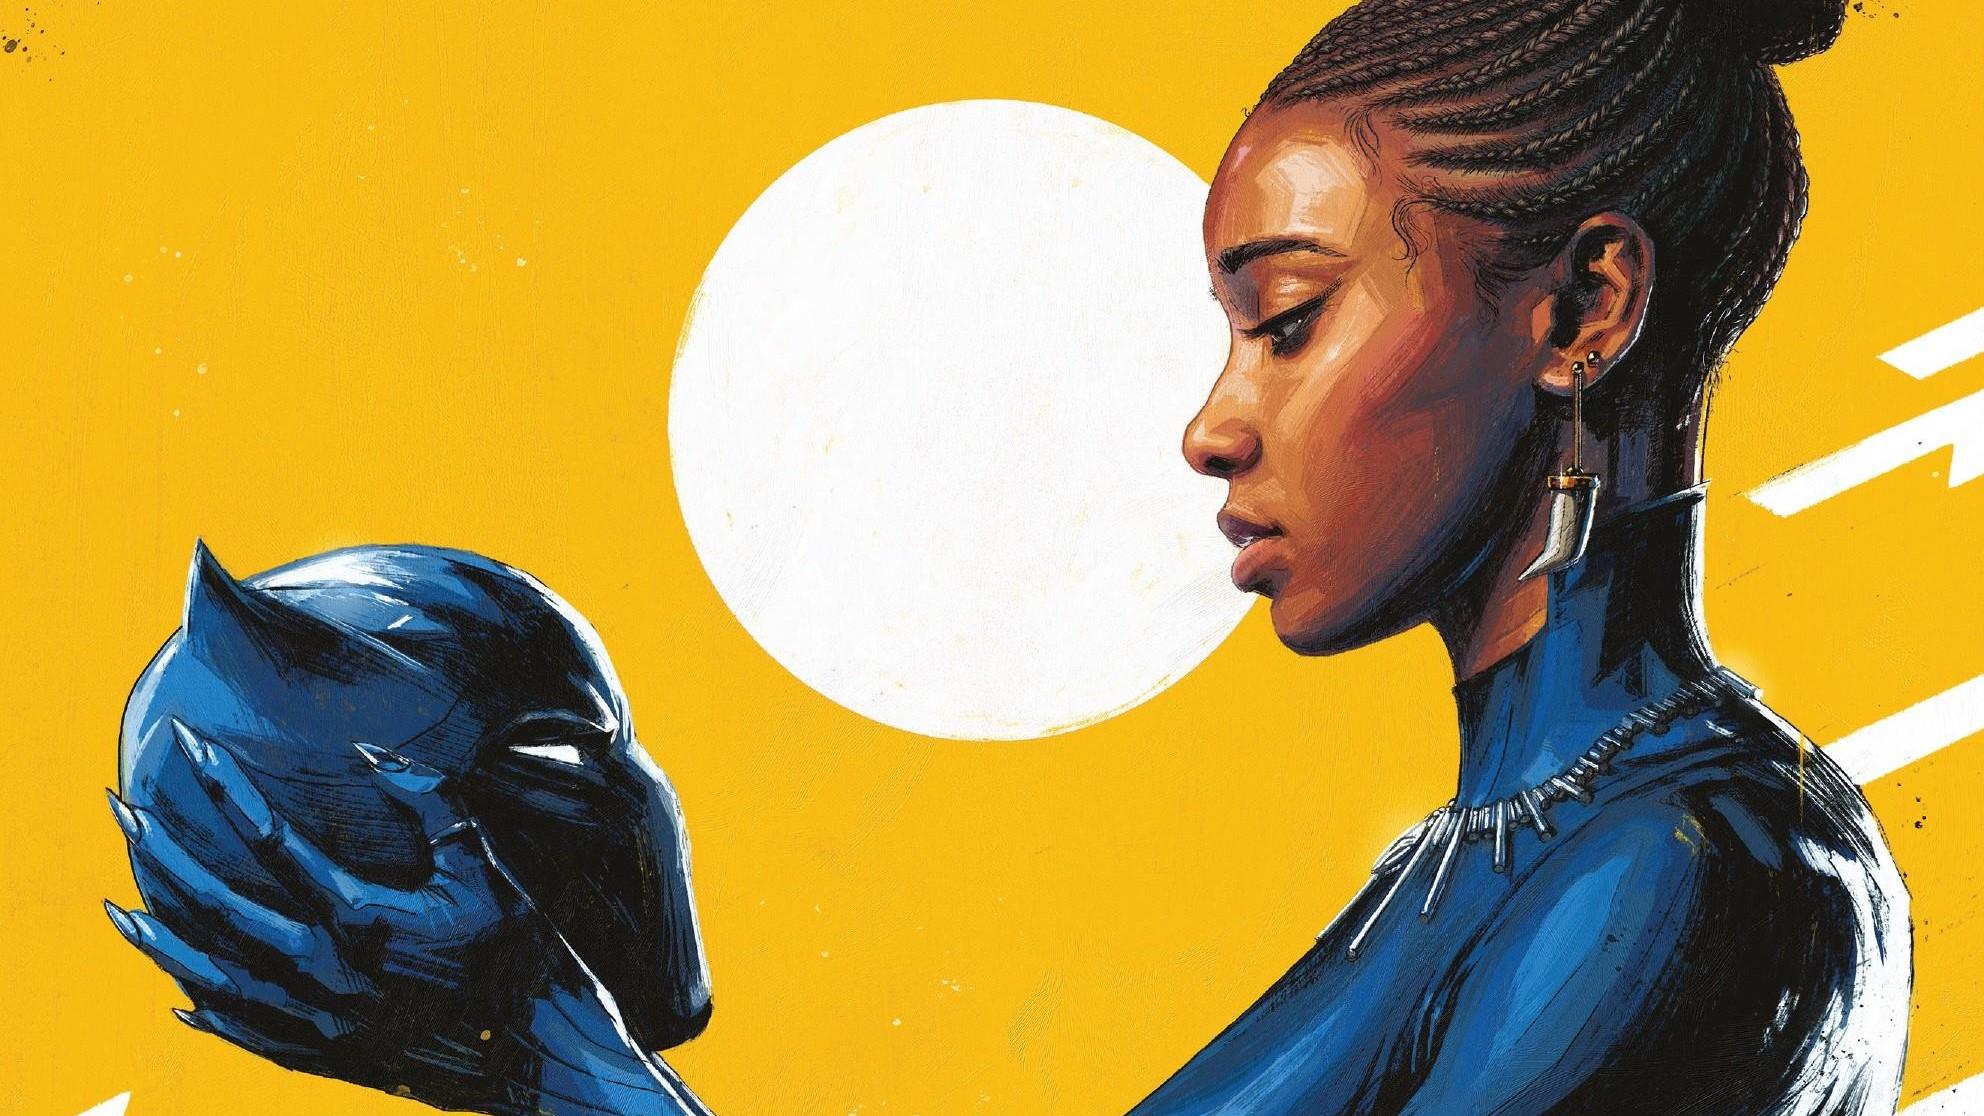 General 1984x1116 comics comic art comic books Comic Girls (Series) Marvel Comics Sun Black Panther Shuri ebony black women brunette braided hair